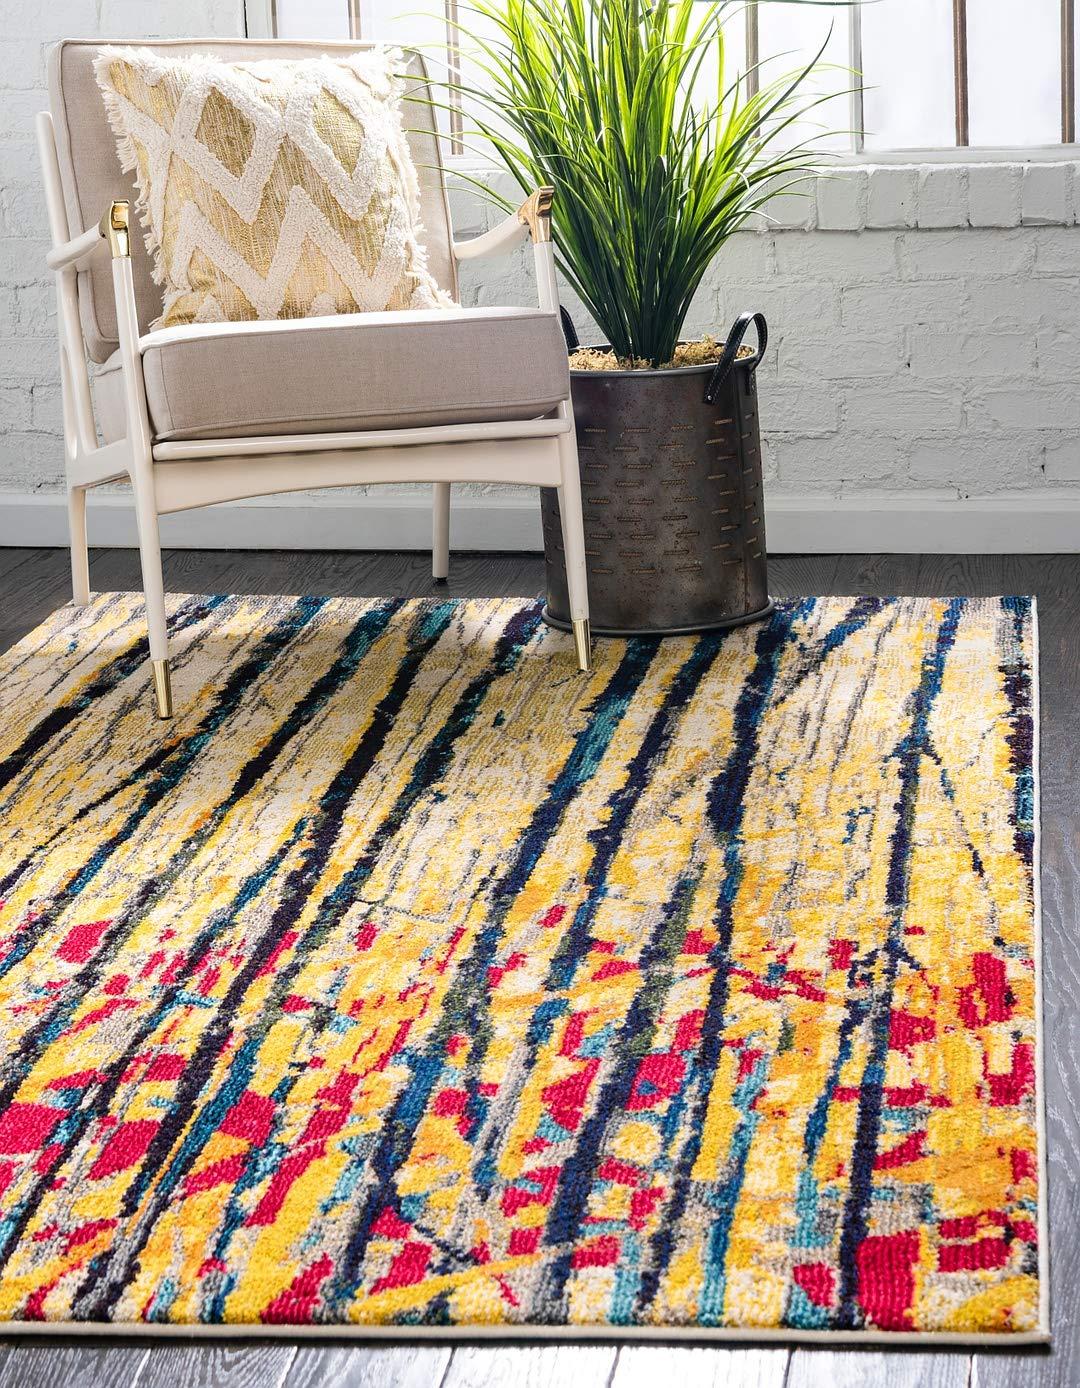 Unique Loom Estrella Collection Colorful Abstract Yellow Area Rug 3 3 x 5 3